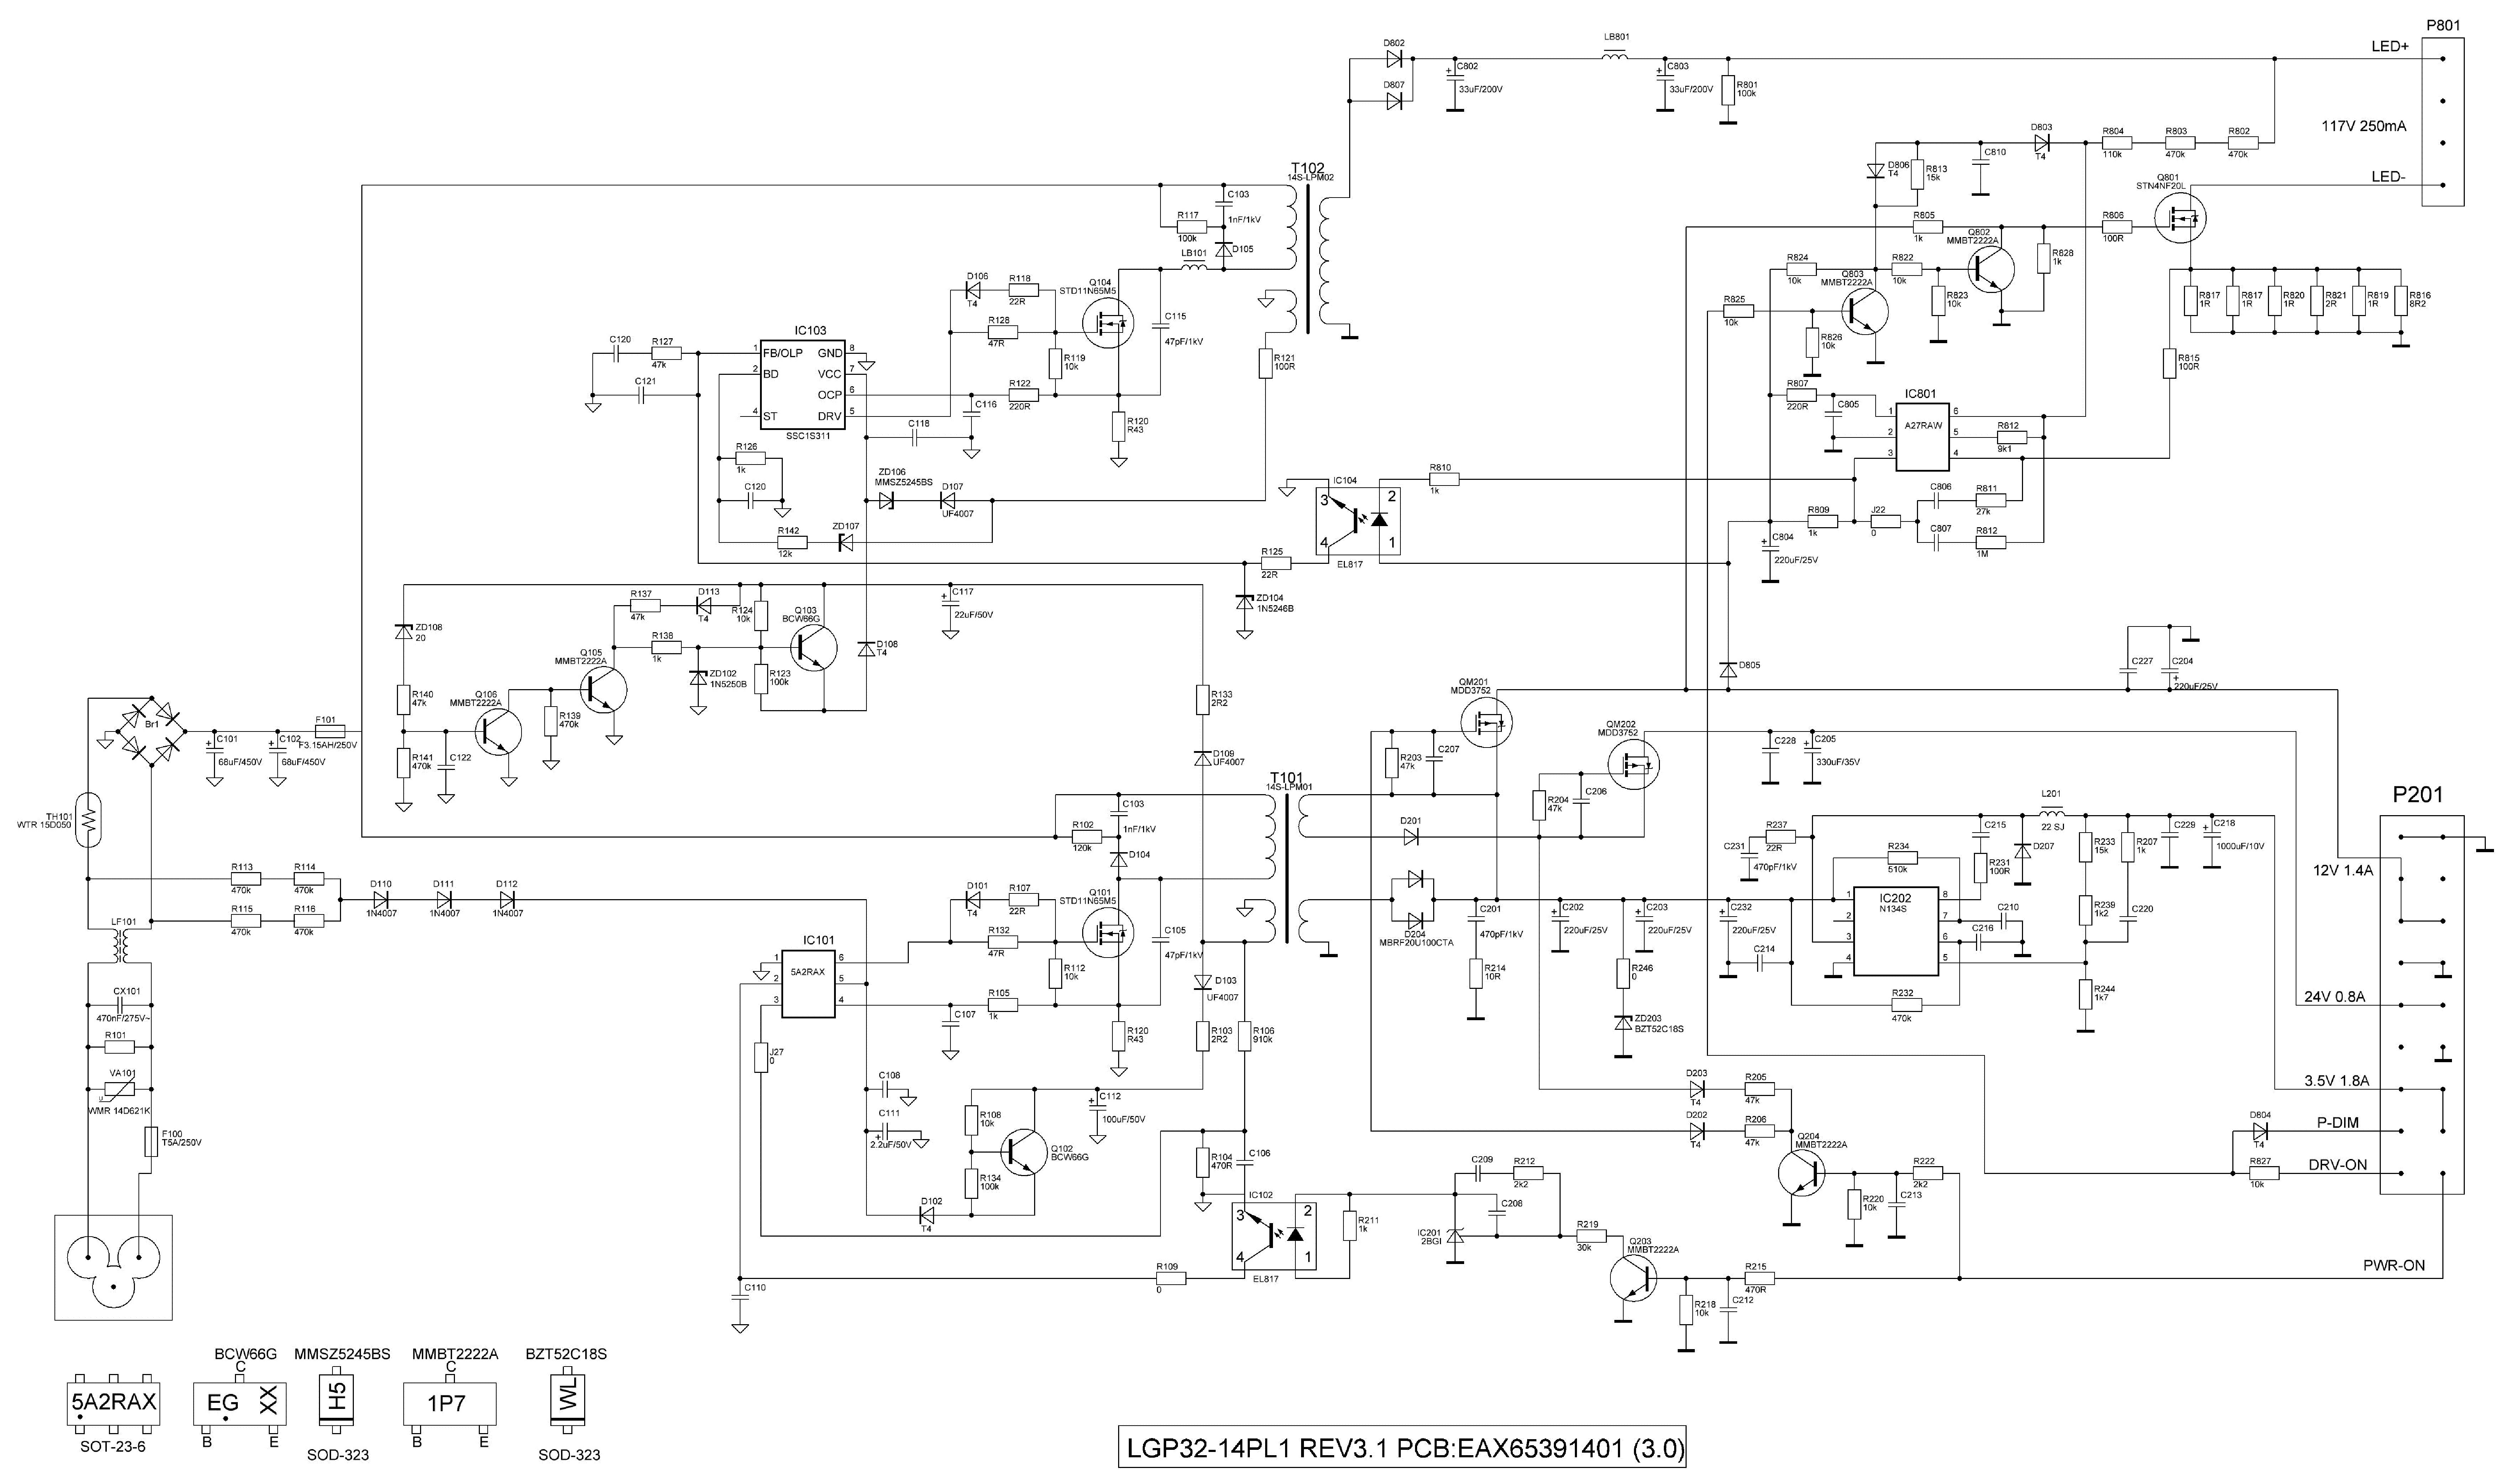 Haier 46ep14s Plasma Television Schematic Diagram Manual